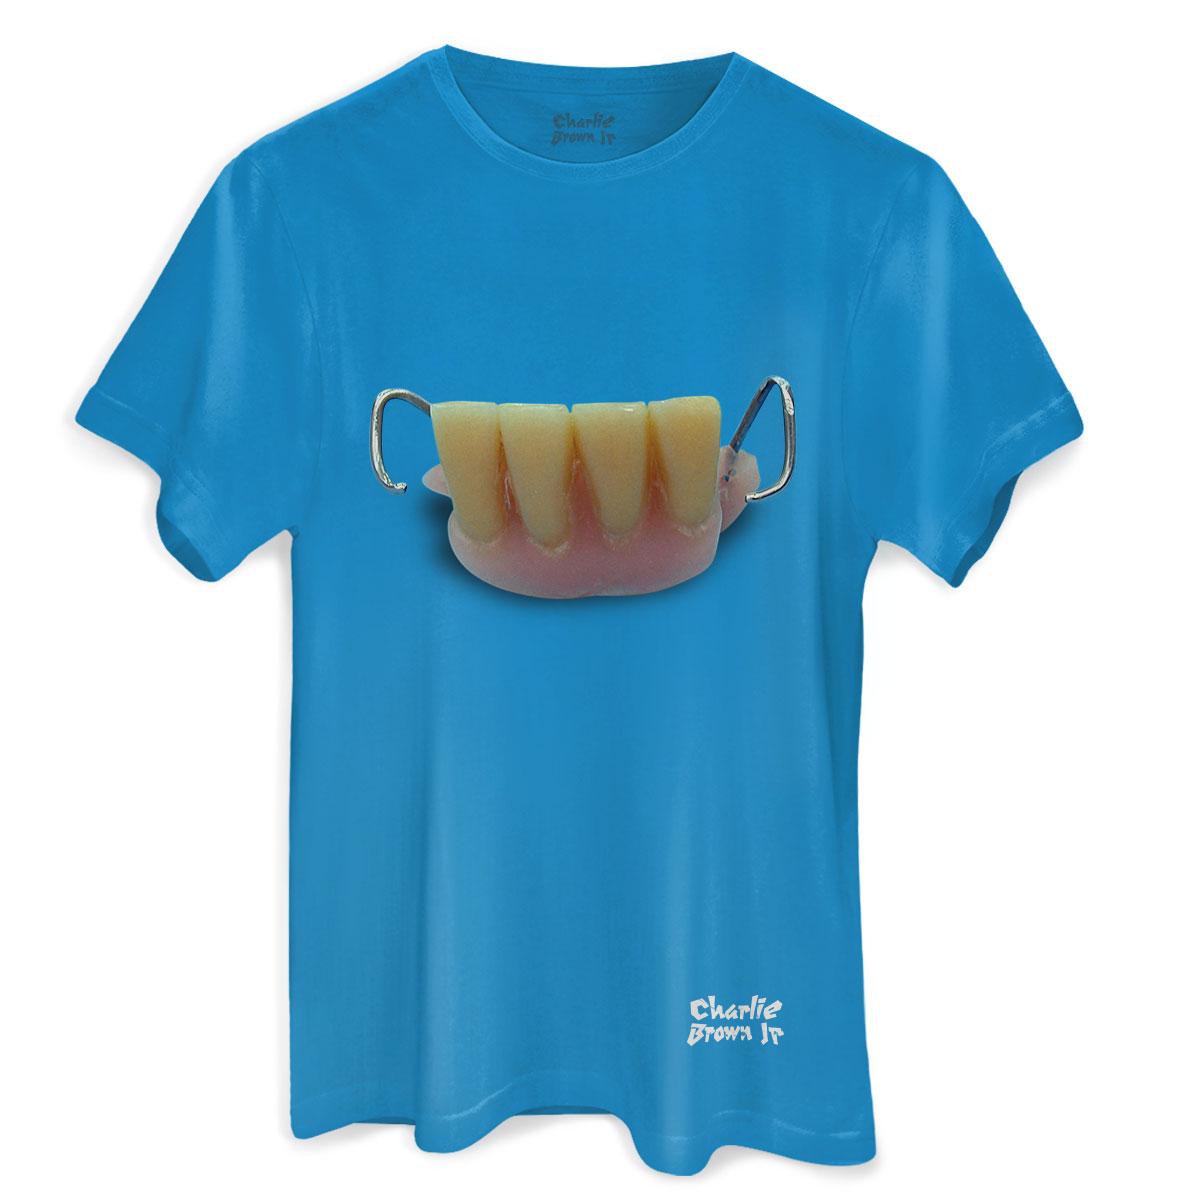 Camiseta Masculina Charlie Brown Jr. Bocas Ordin�rias